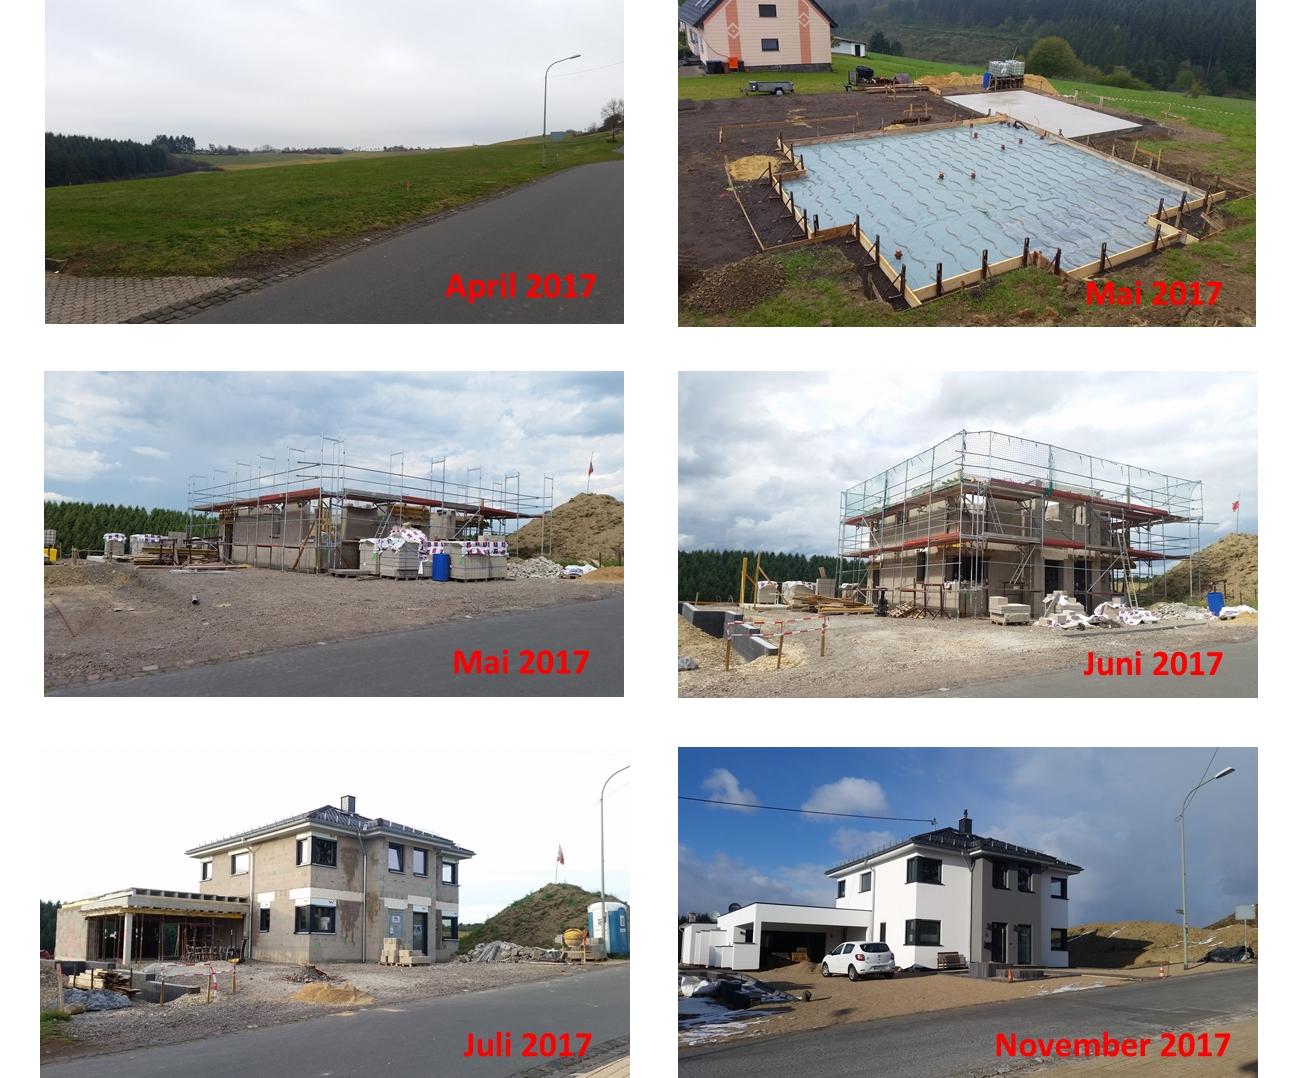 Baufortschritte Mai-November 2017